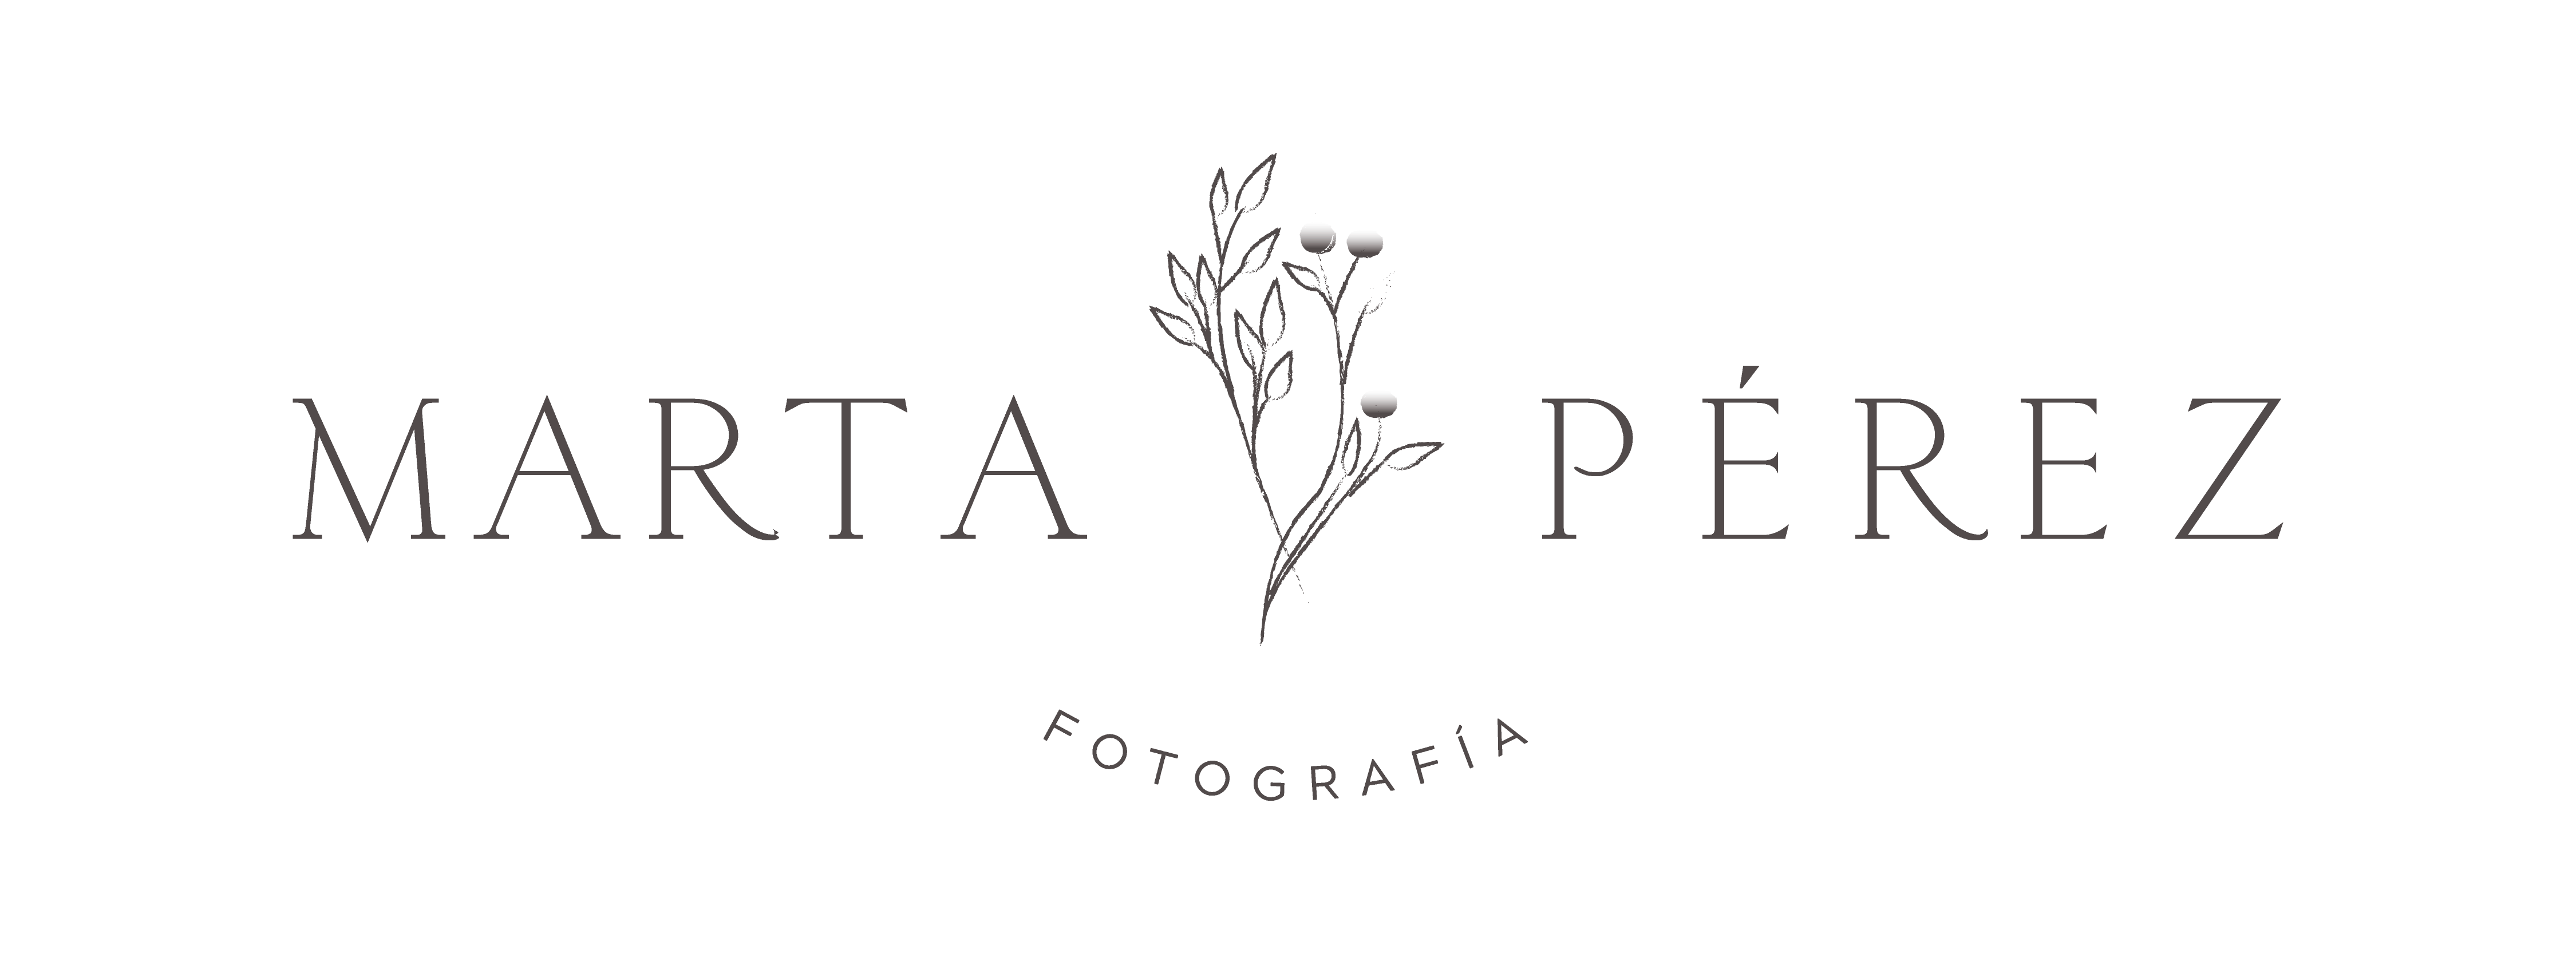 Marta Perez Fotografia